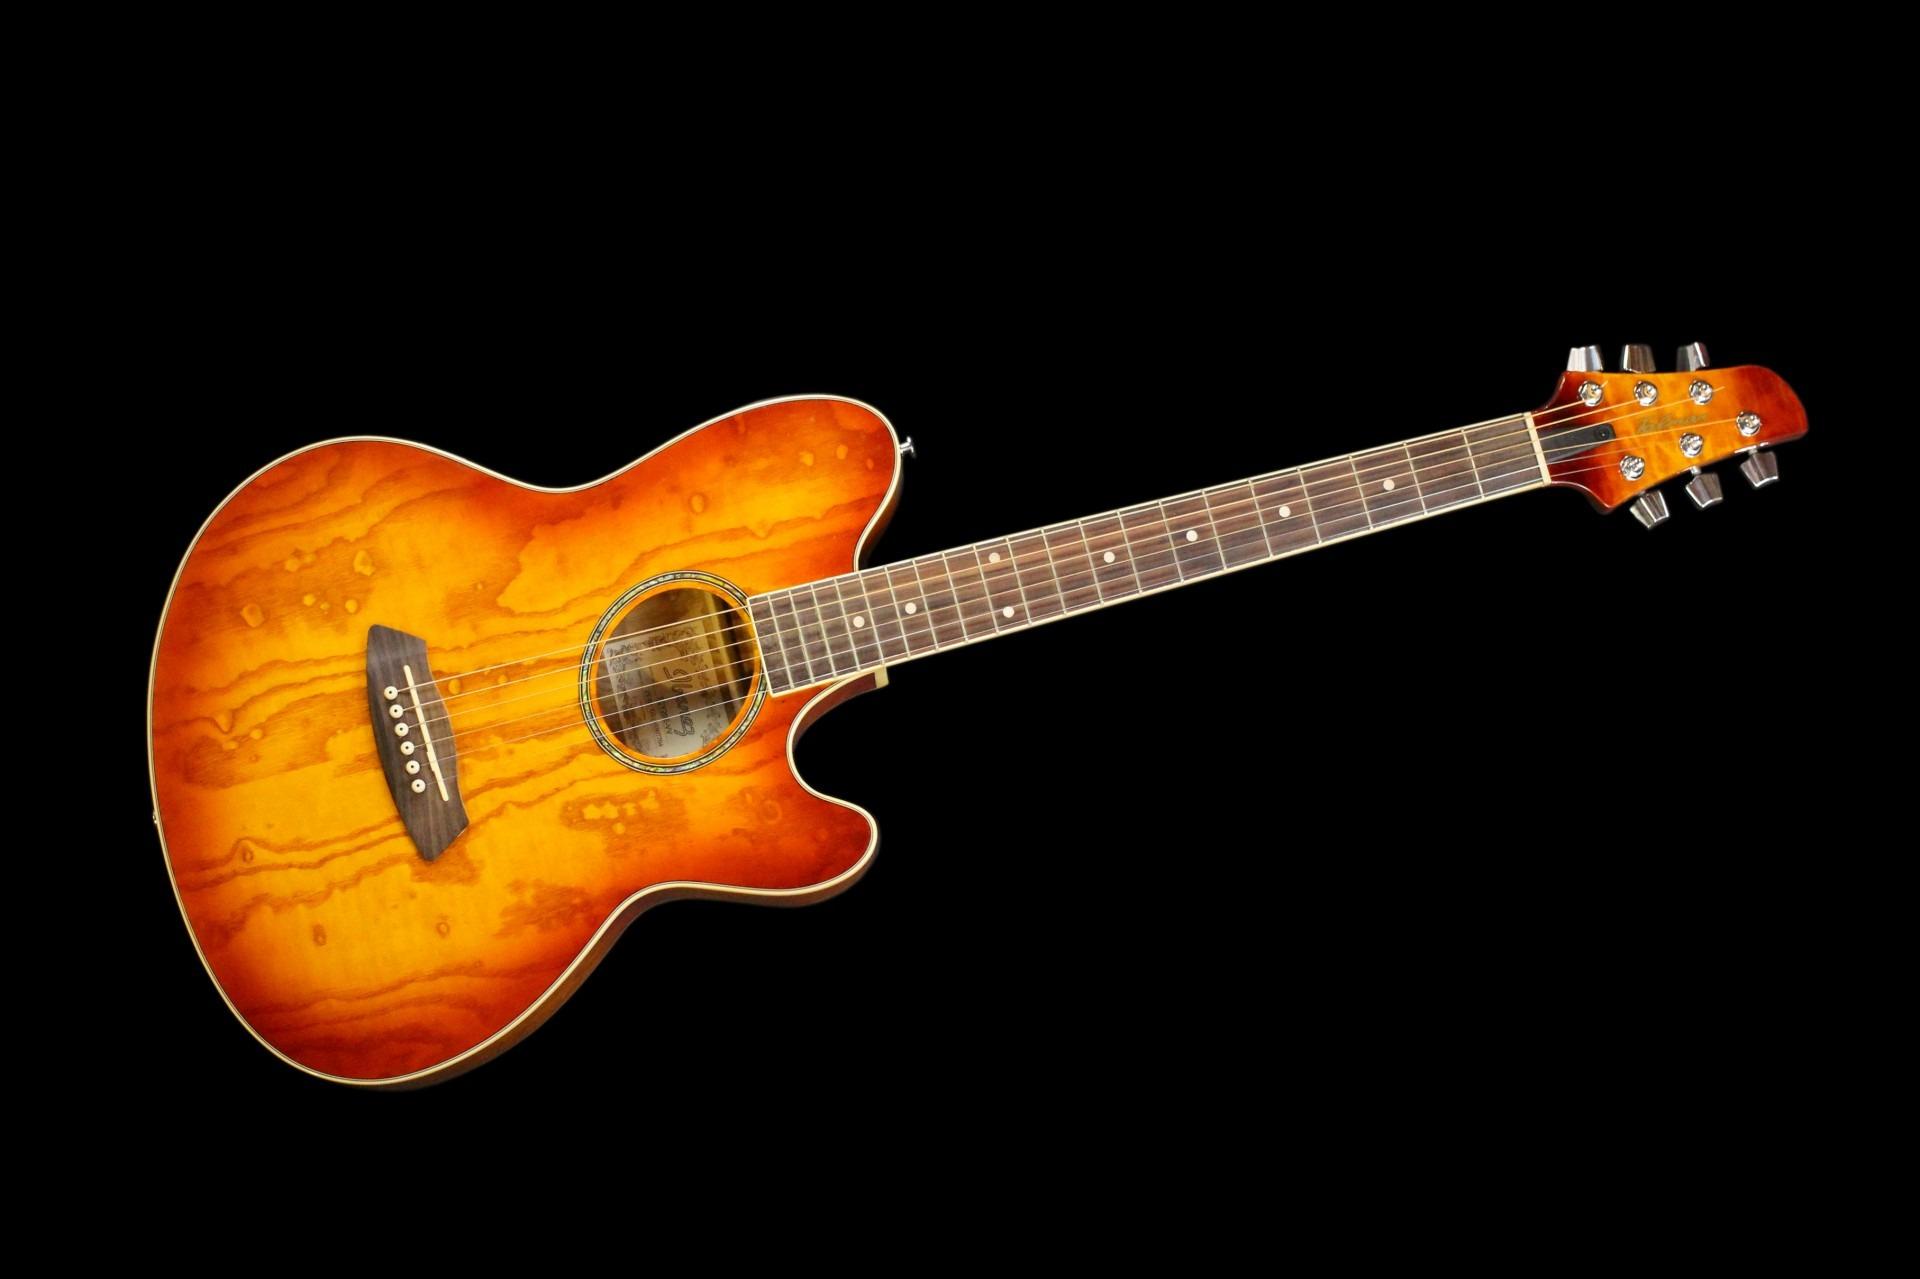 Картинка гитары музыкальный инструмент